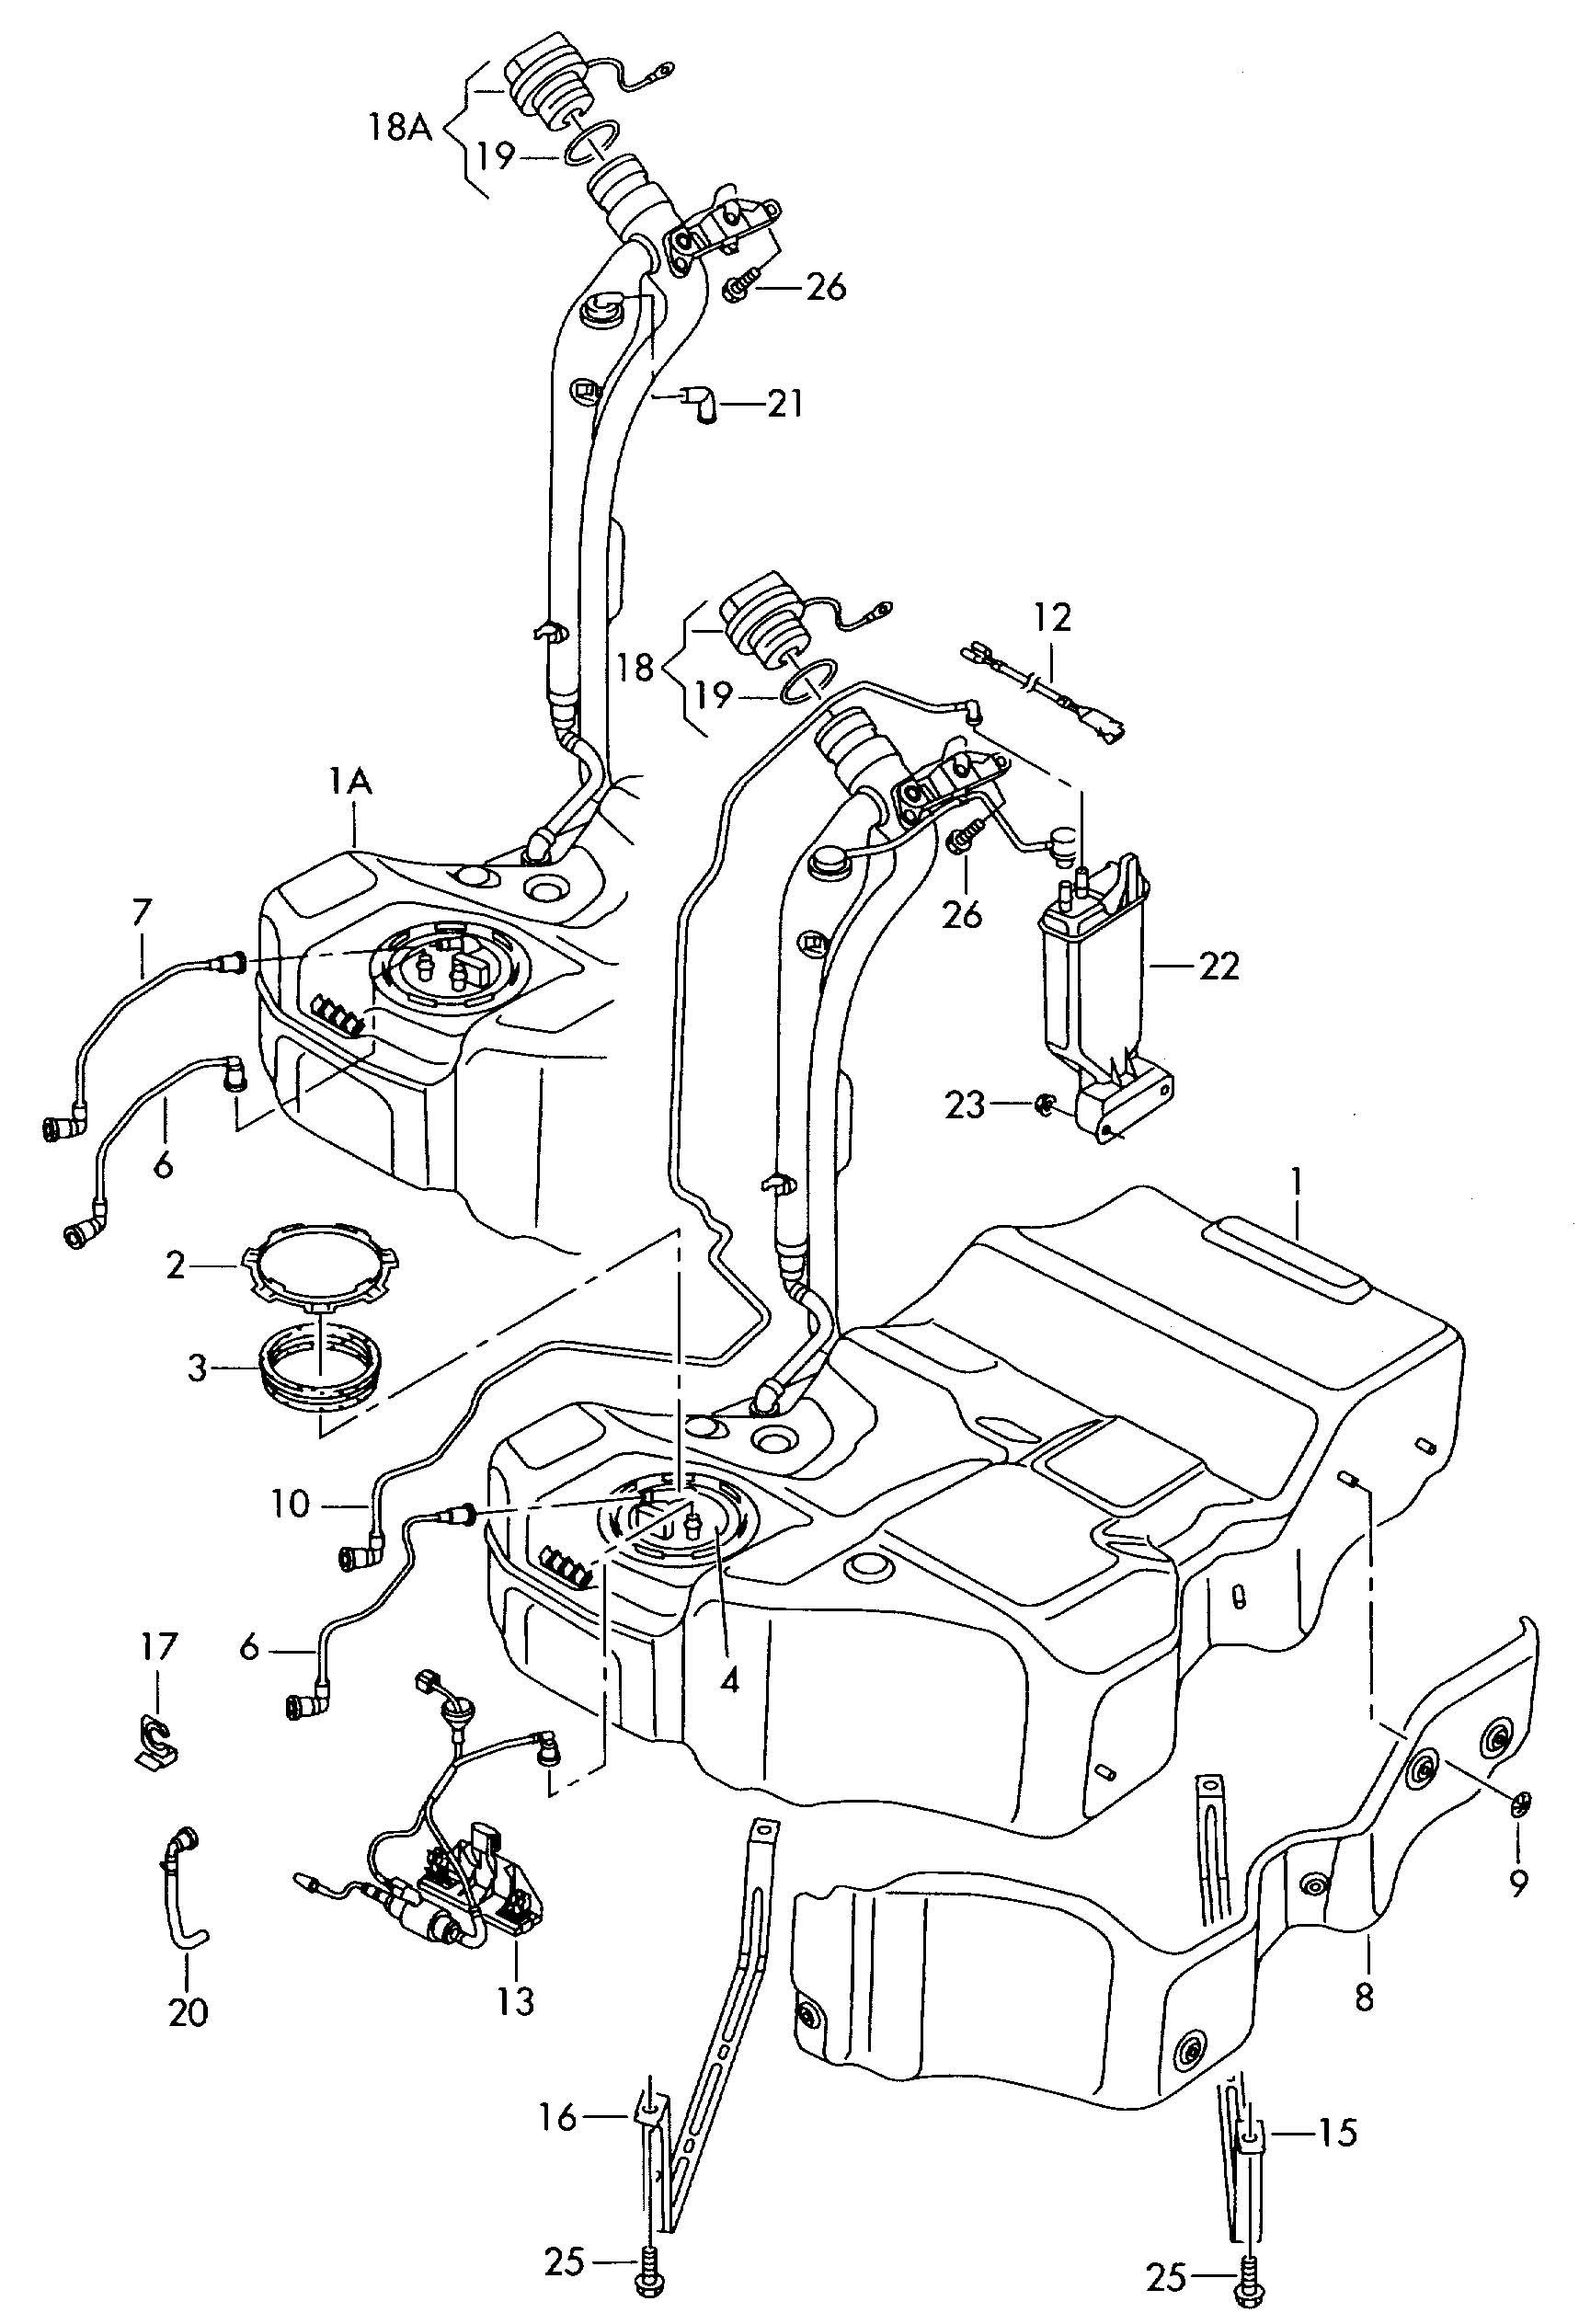 Volkswagen Passat Cc Fuel Tank Evaporative Emission Canister